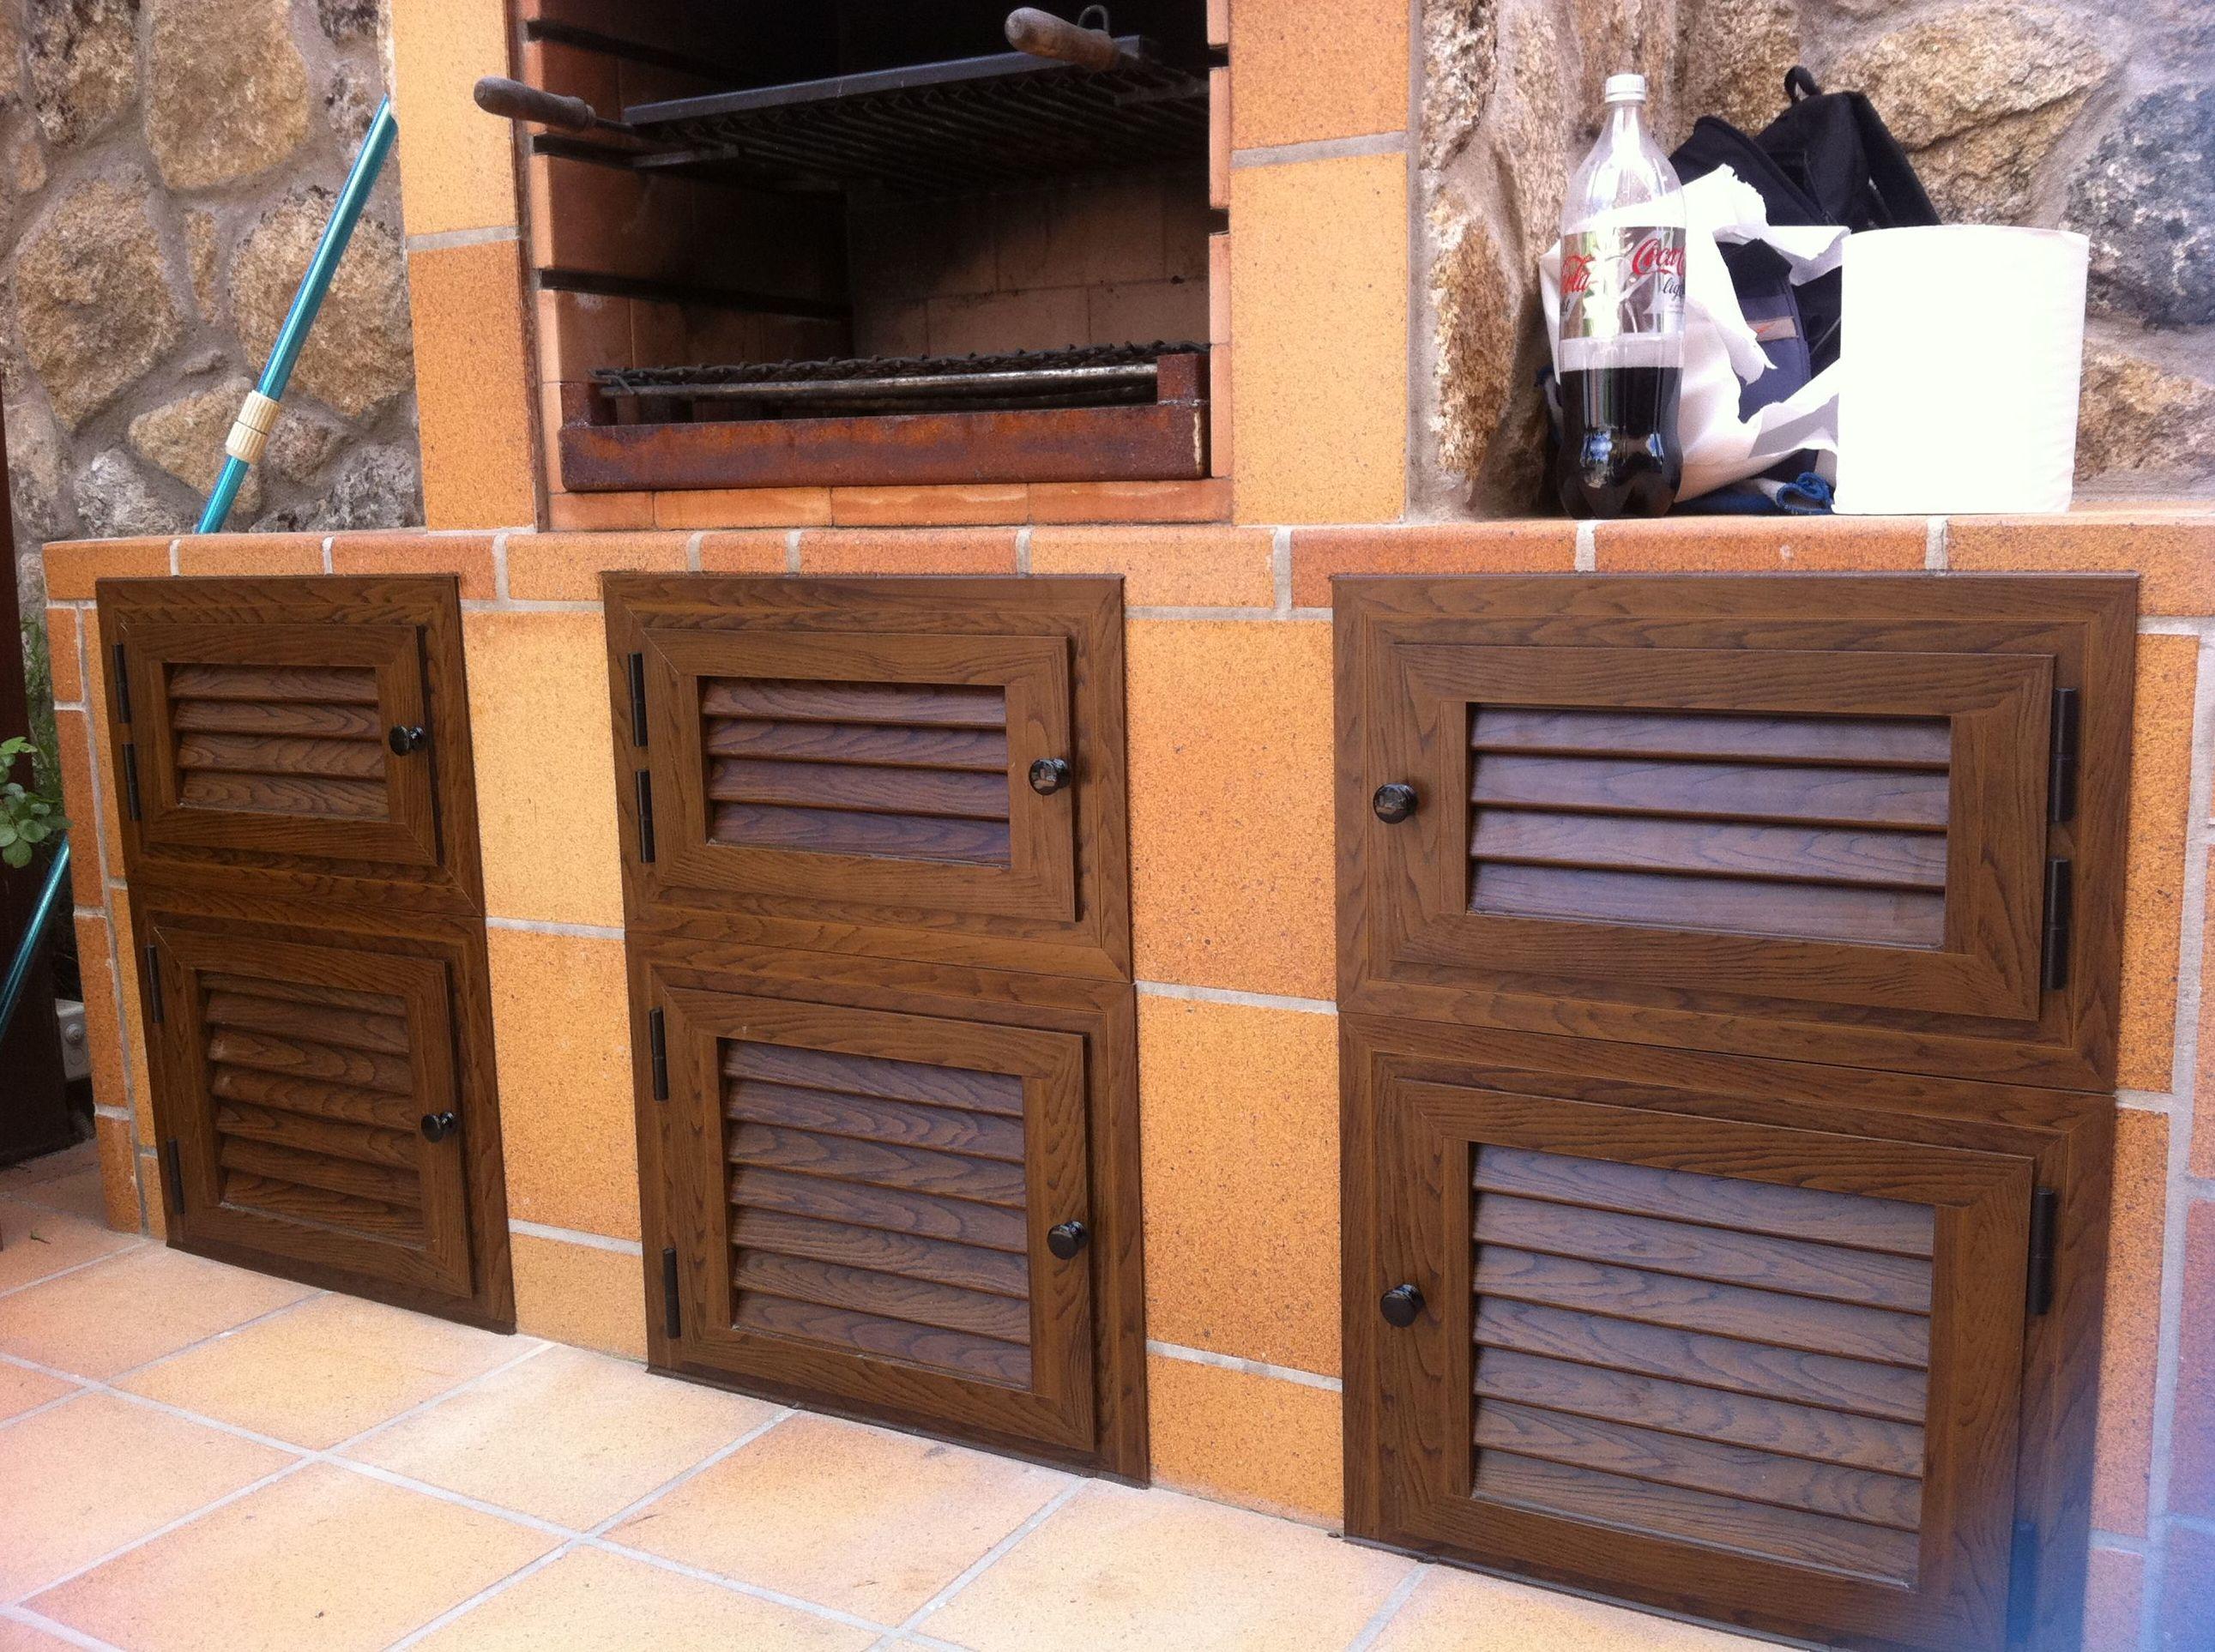 Puertas de aluminio imitación madera